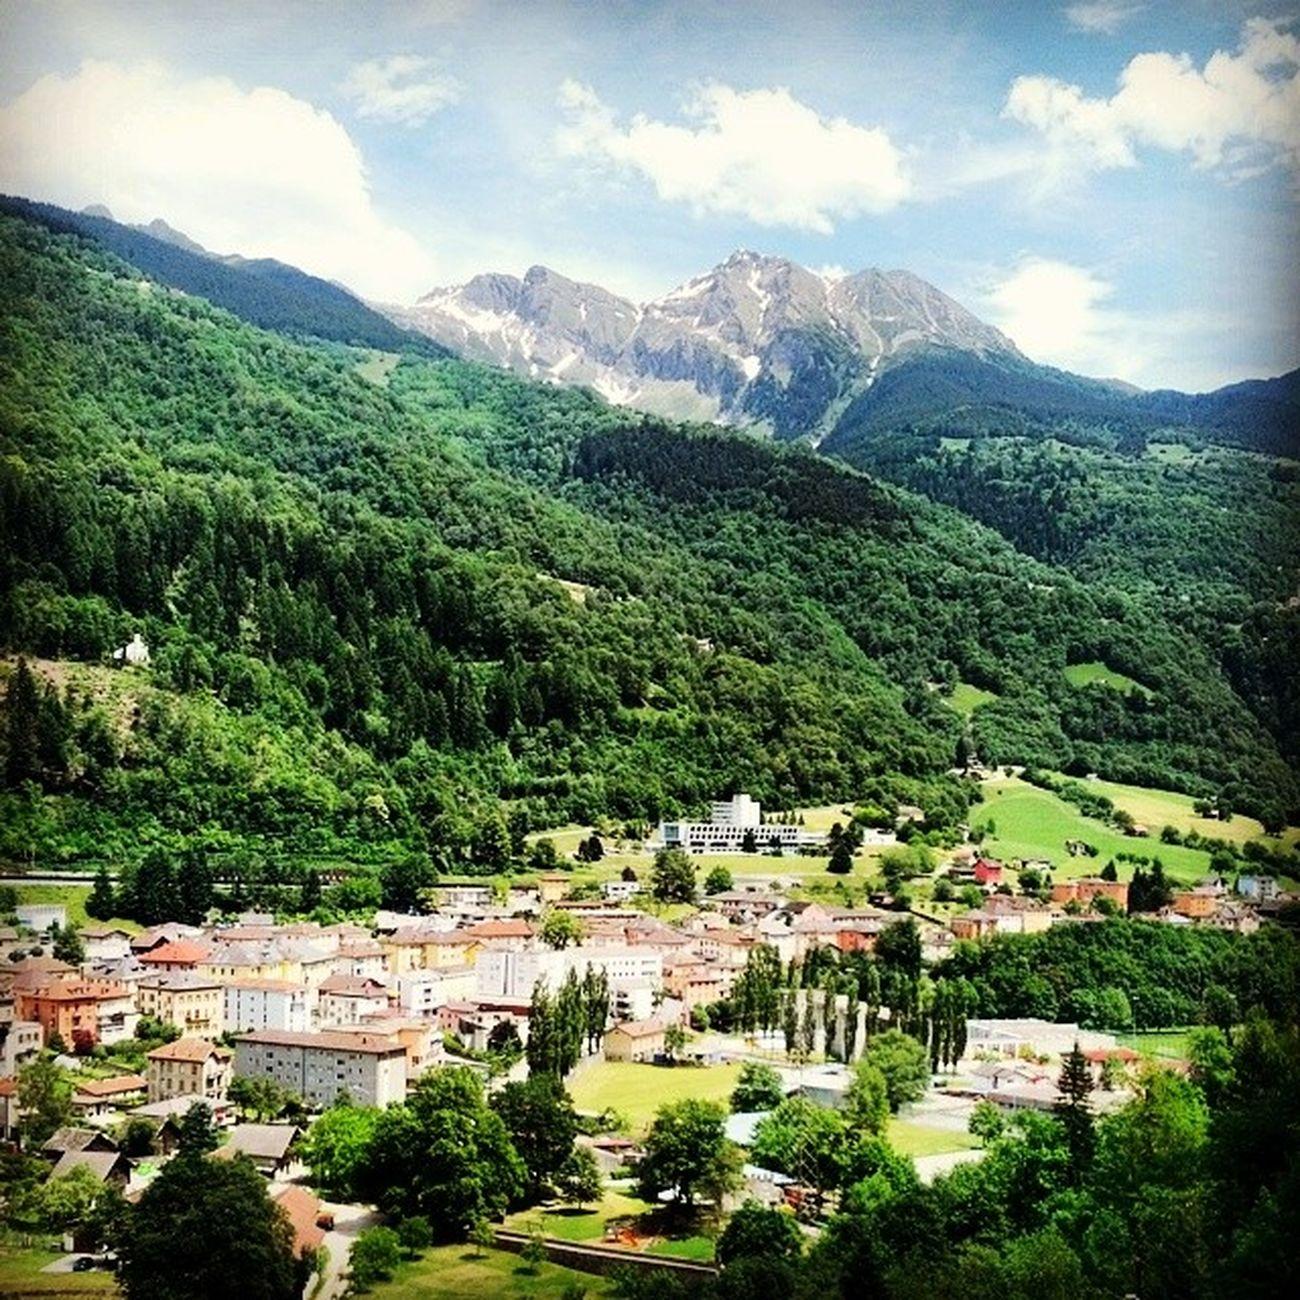 Faido Ticino Landscape Switzerland myswitzerland